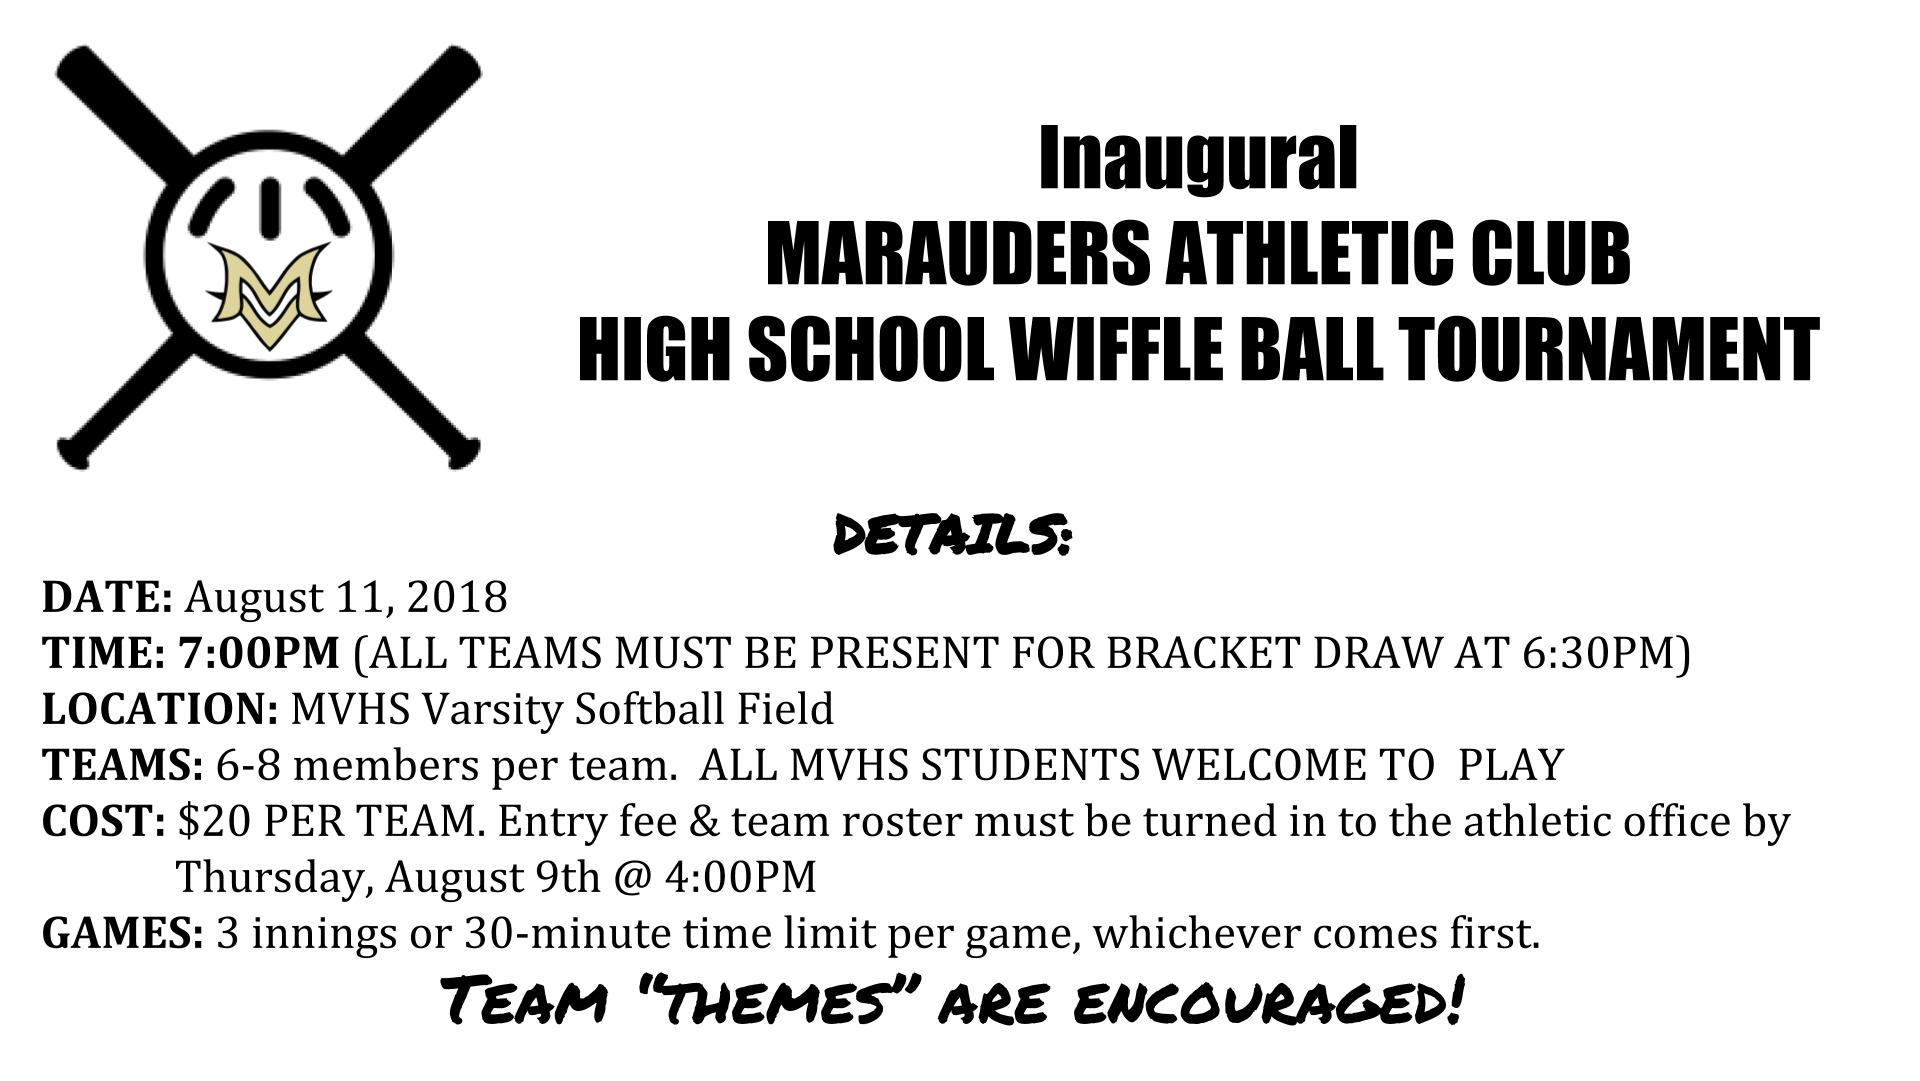 Inaugural High School Wiffle Ball Tourney 8/11!